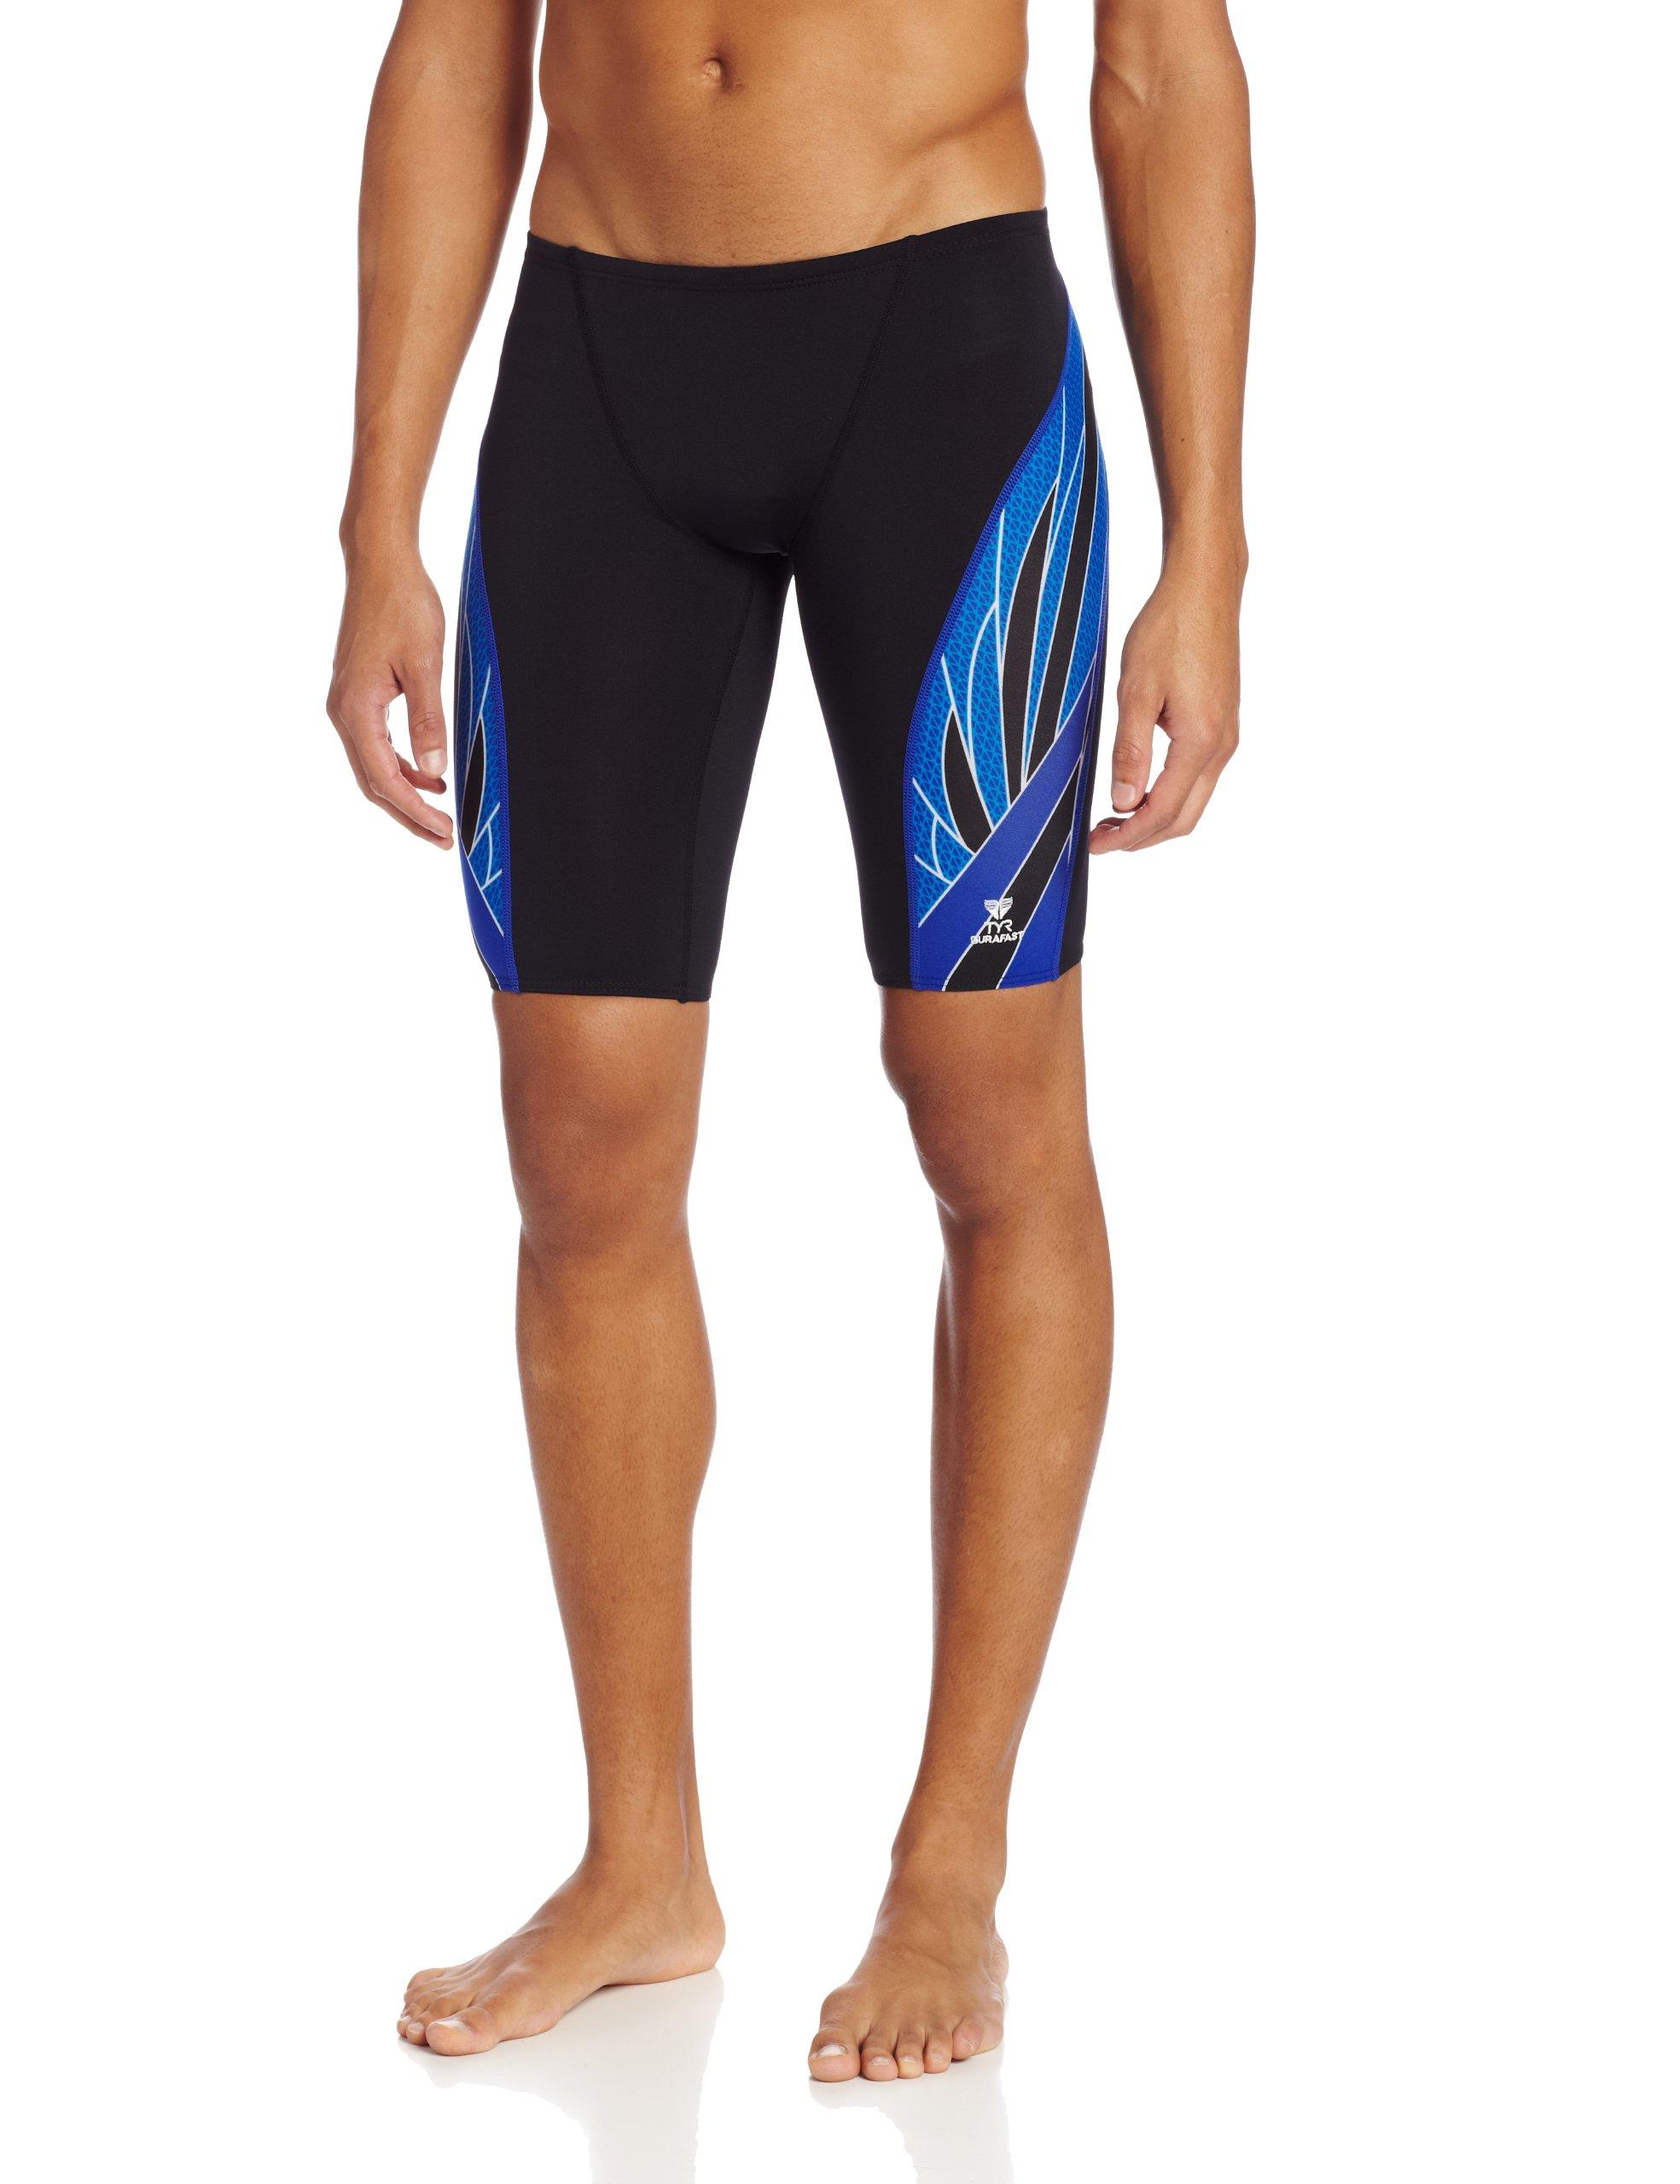 TYR SPORT Men's Phoenix Splice Jammer Swimsuit (Black/Blue, 32)